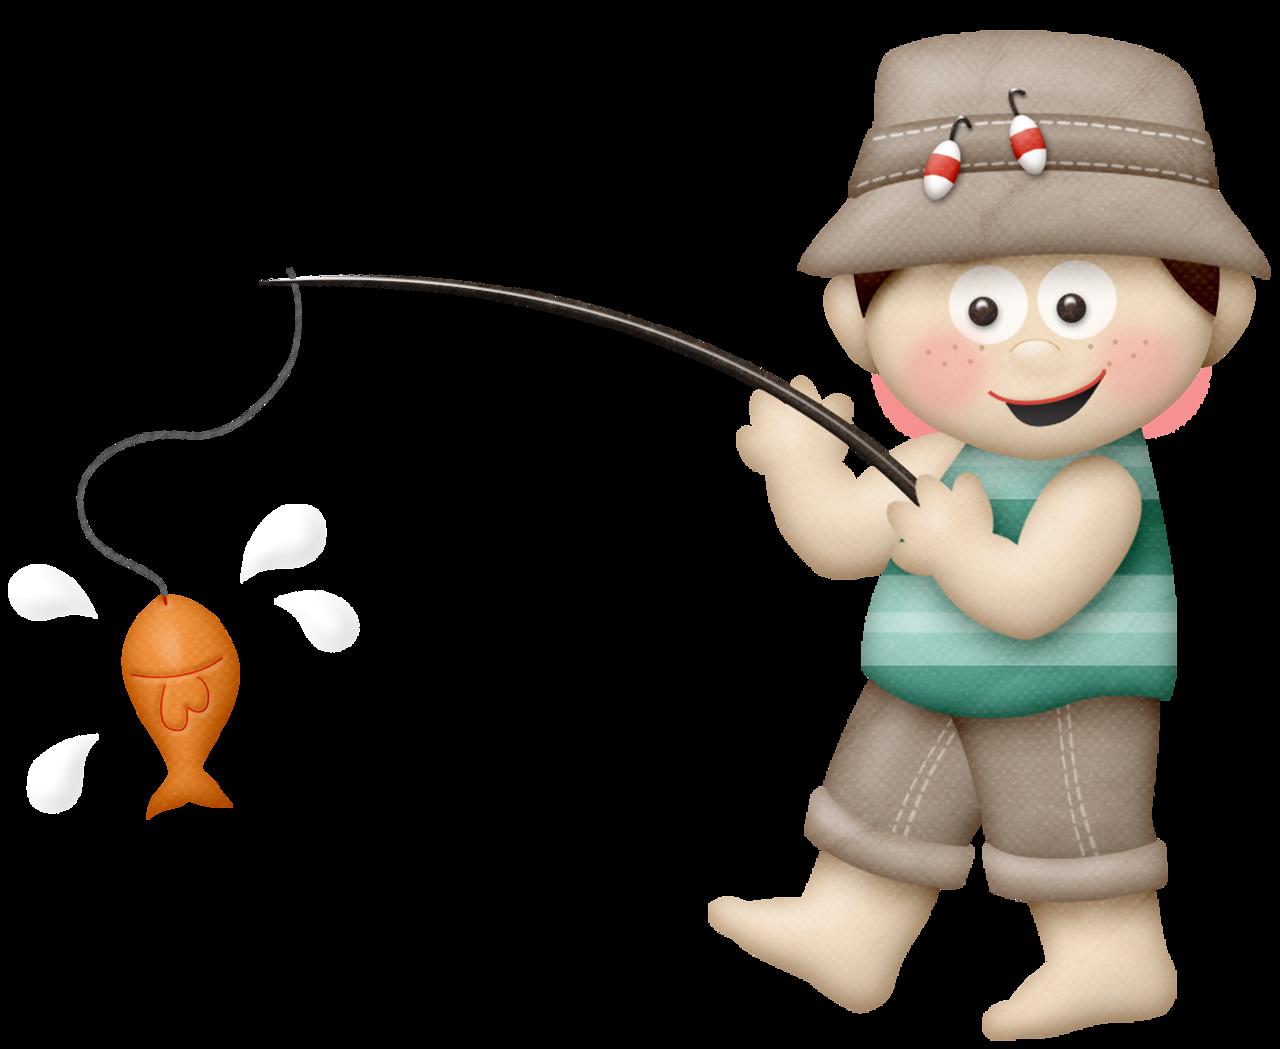 Fishing clipart family fishing. Lliella fishingadv fishingboy a